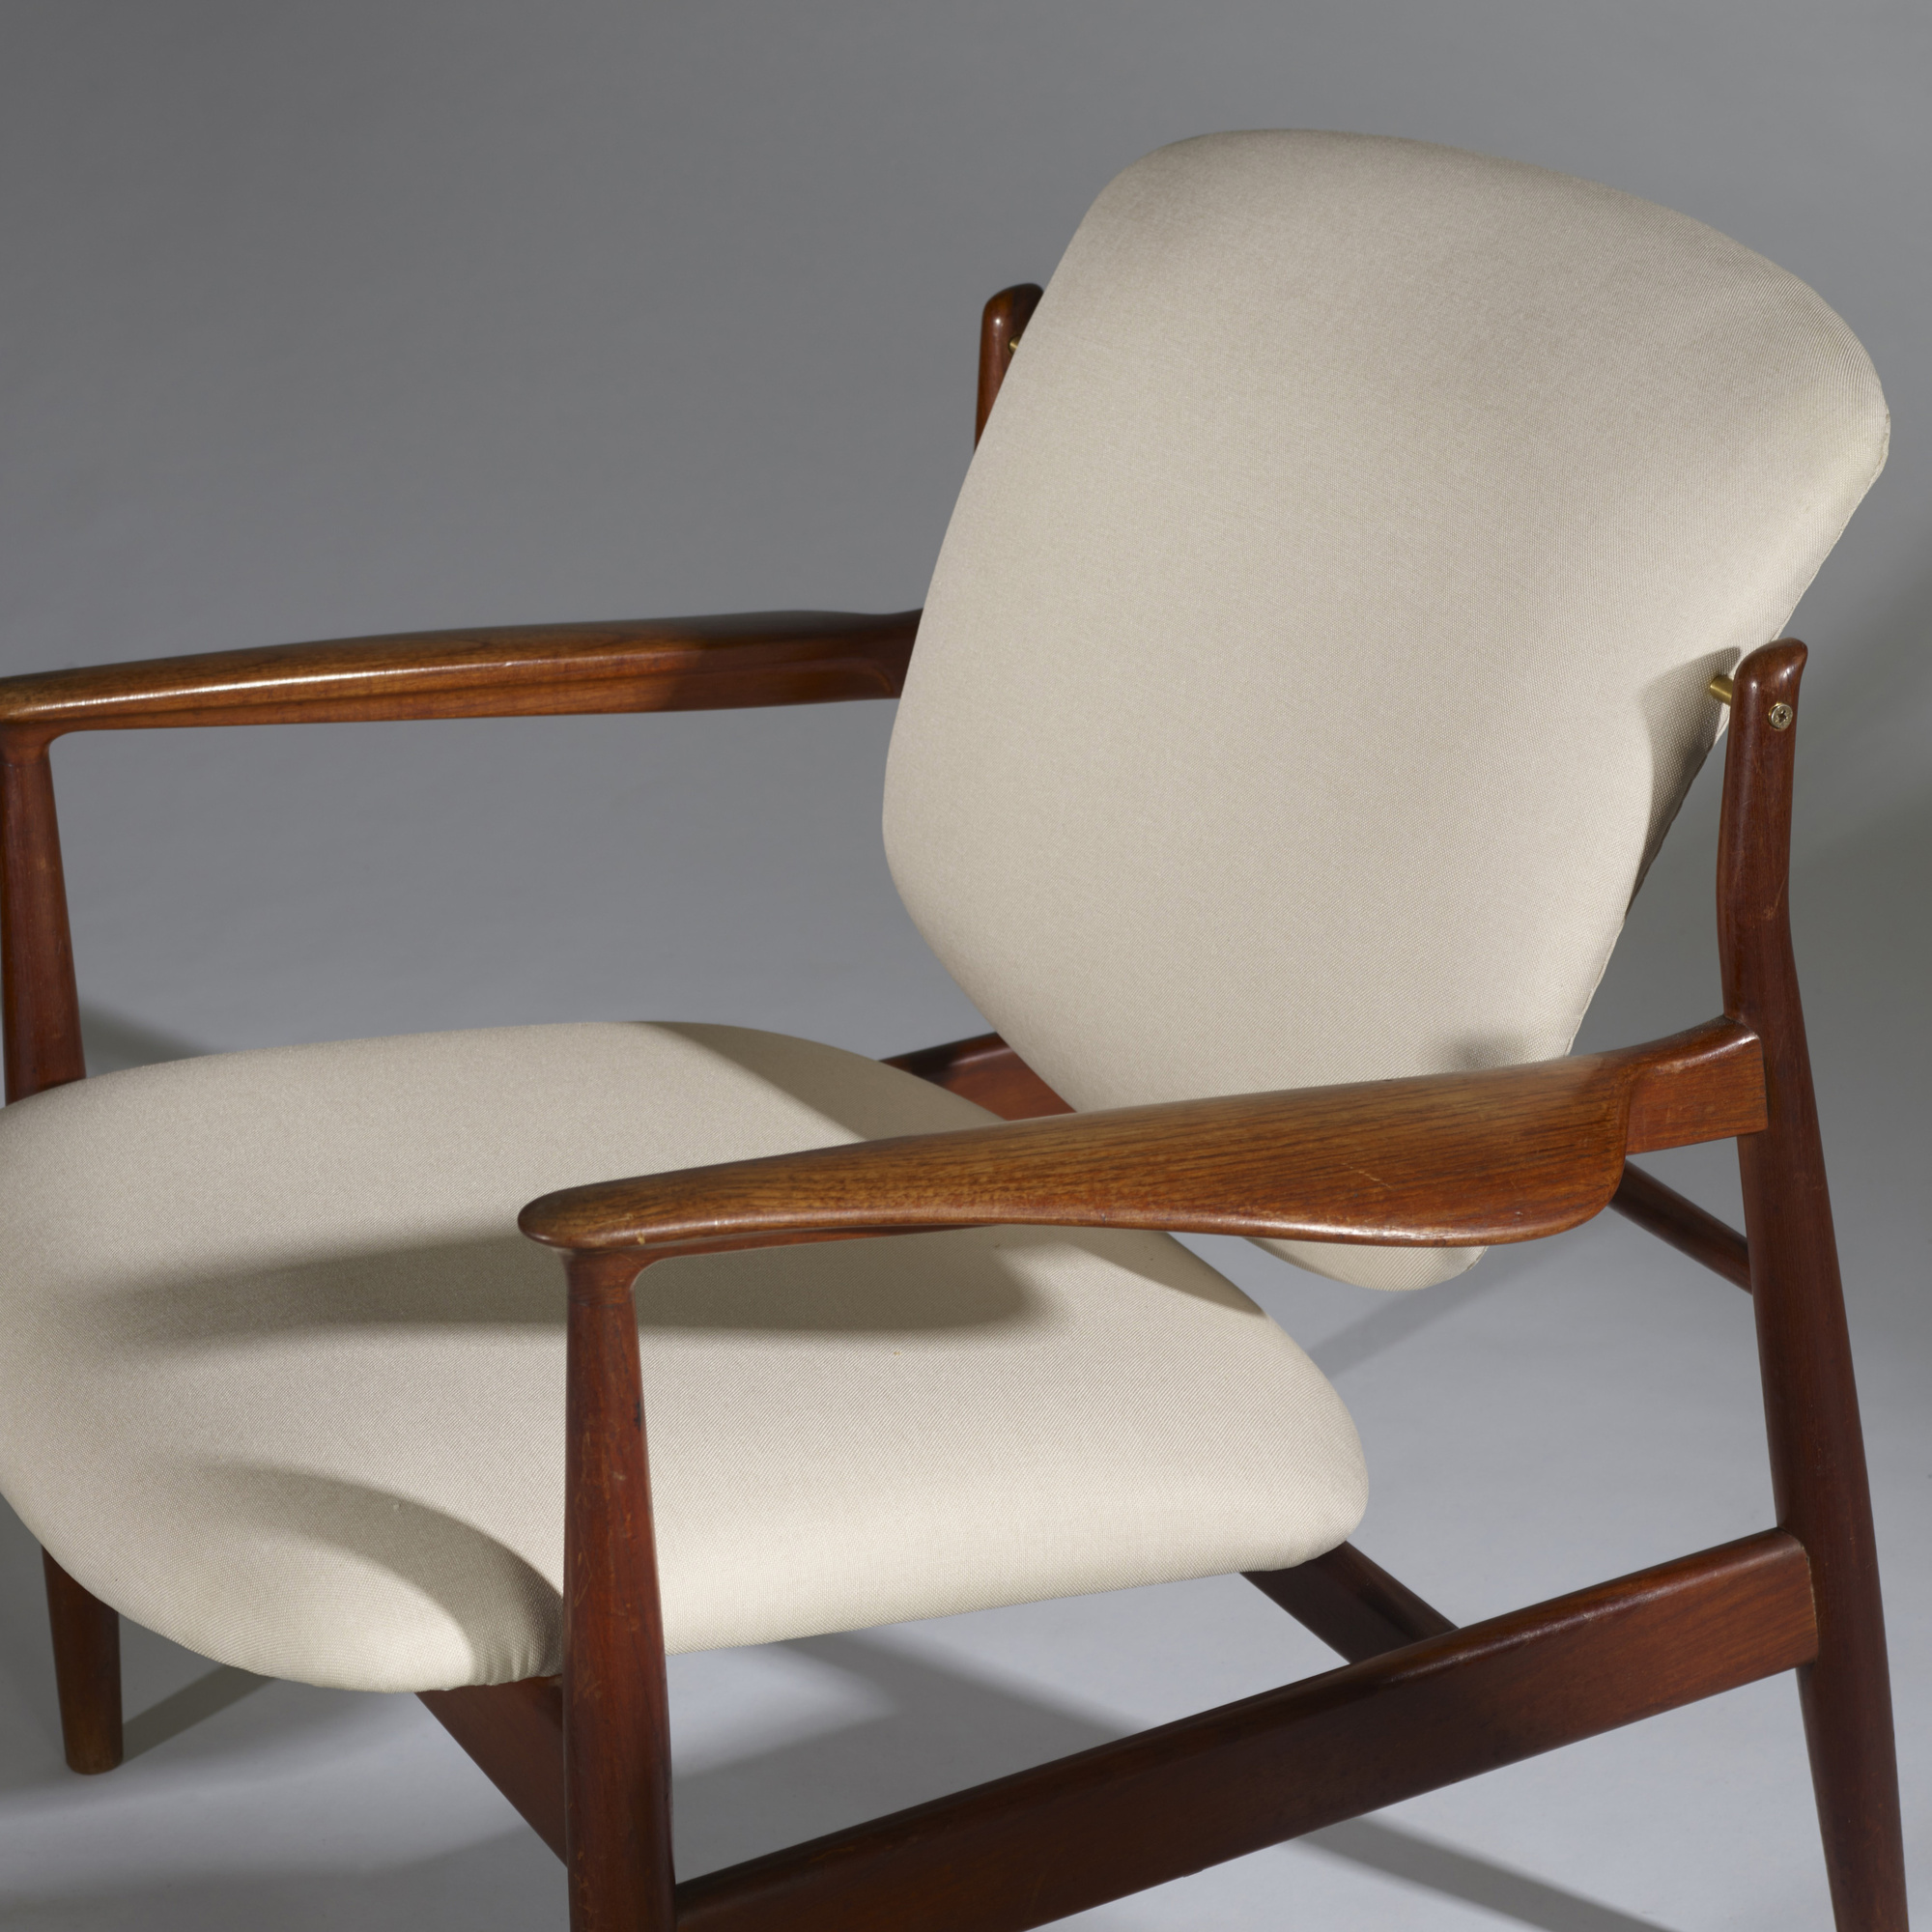 161: Finn Juhl / lounge chairs, pair (3 of 3)